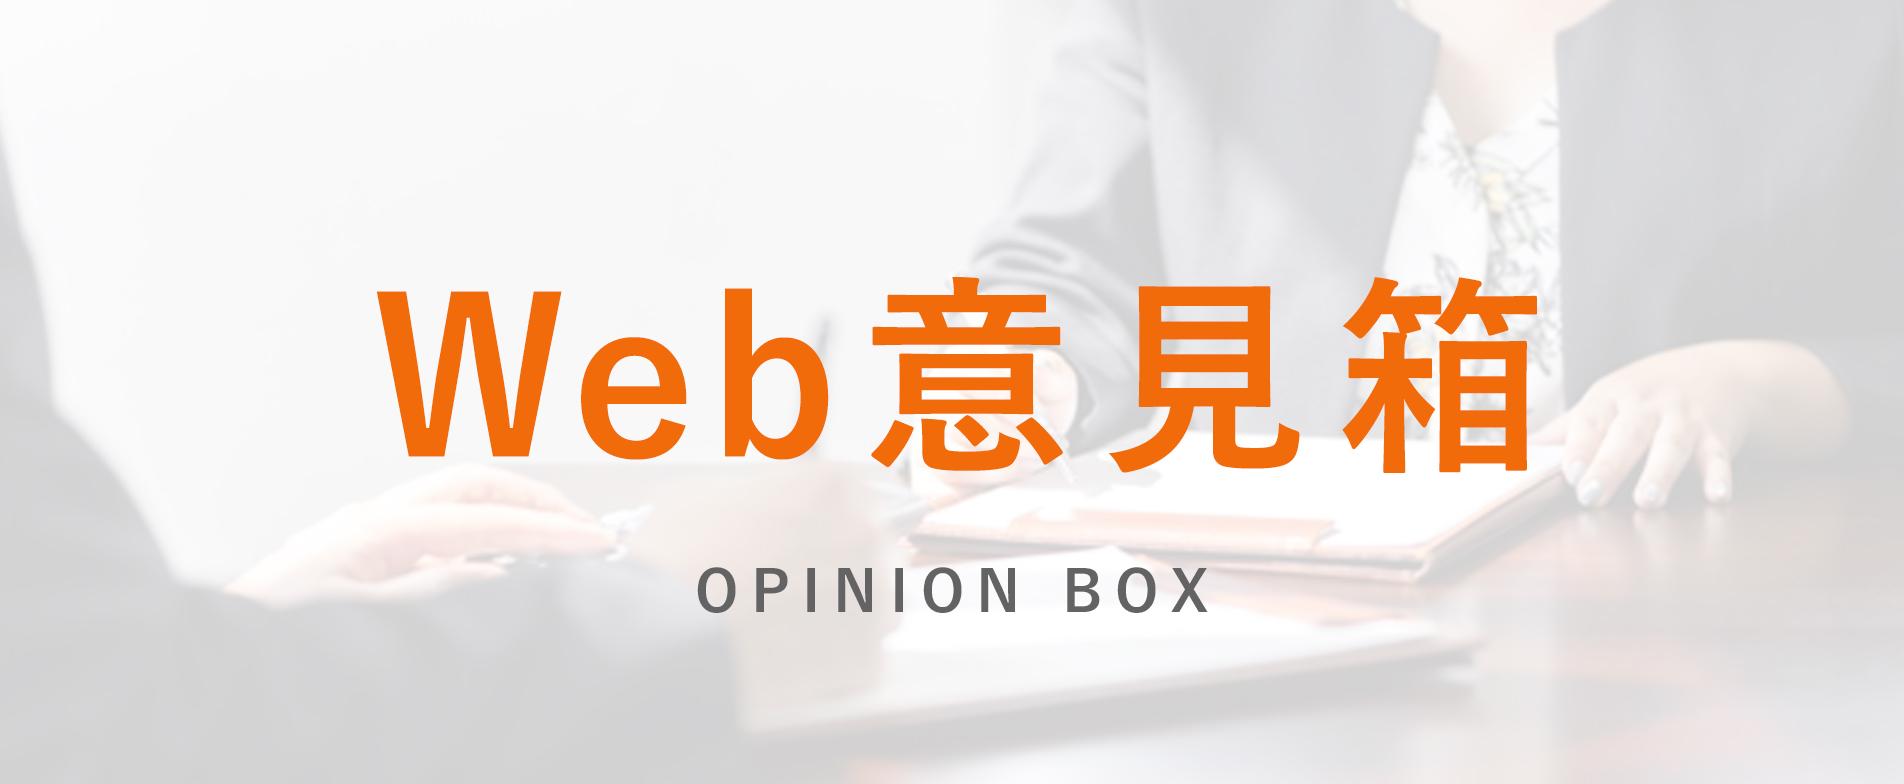 Web意見箱